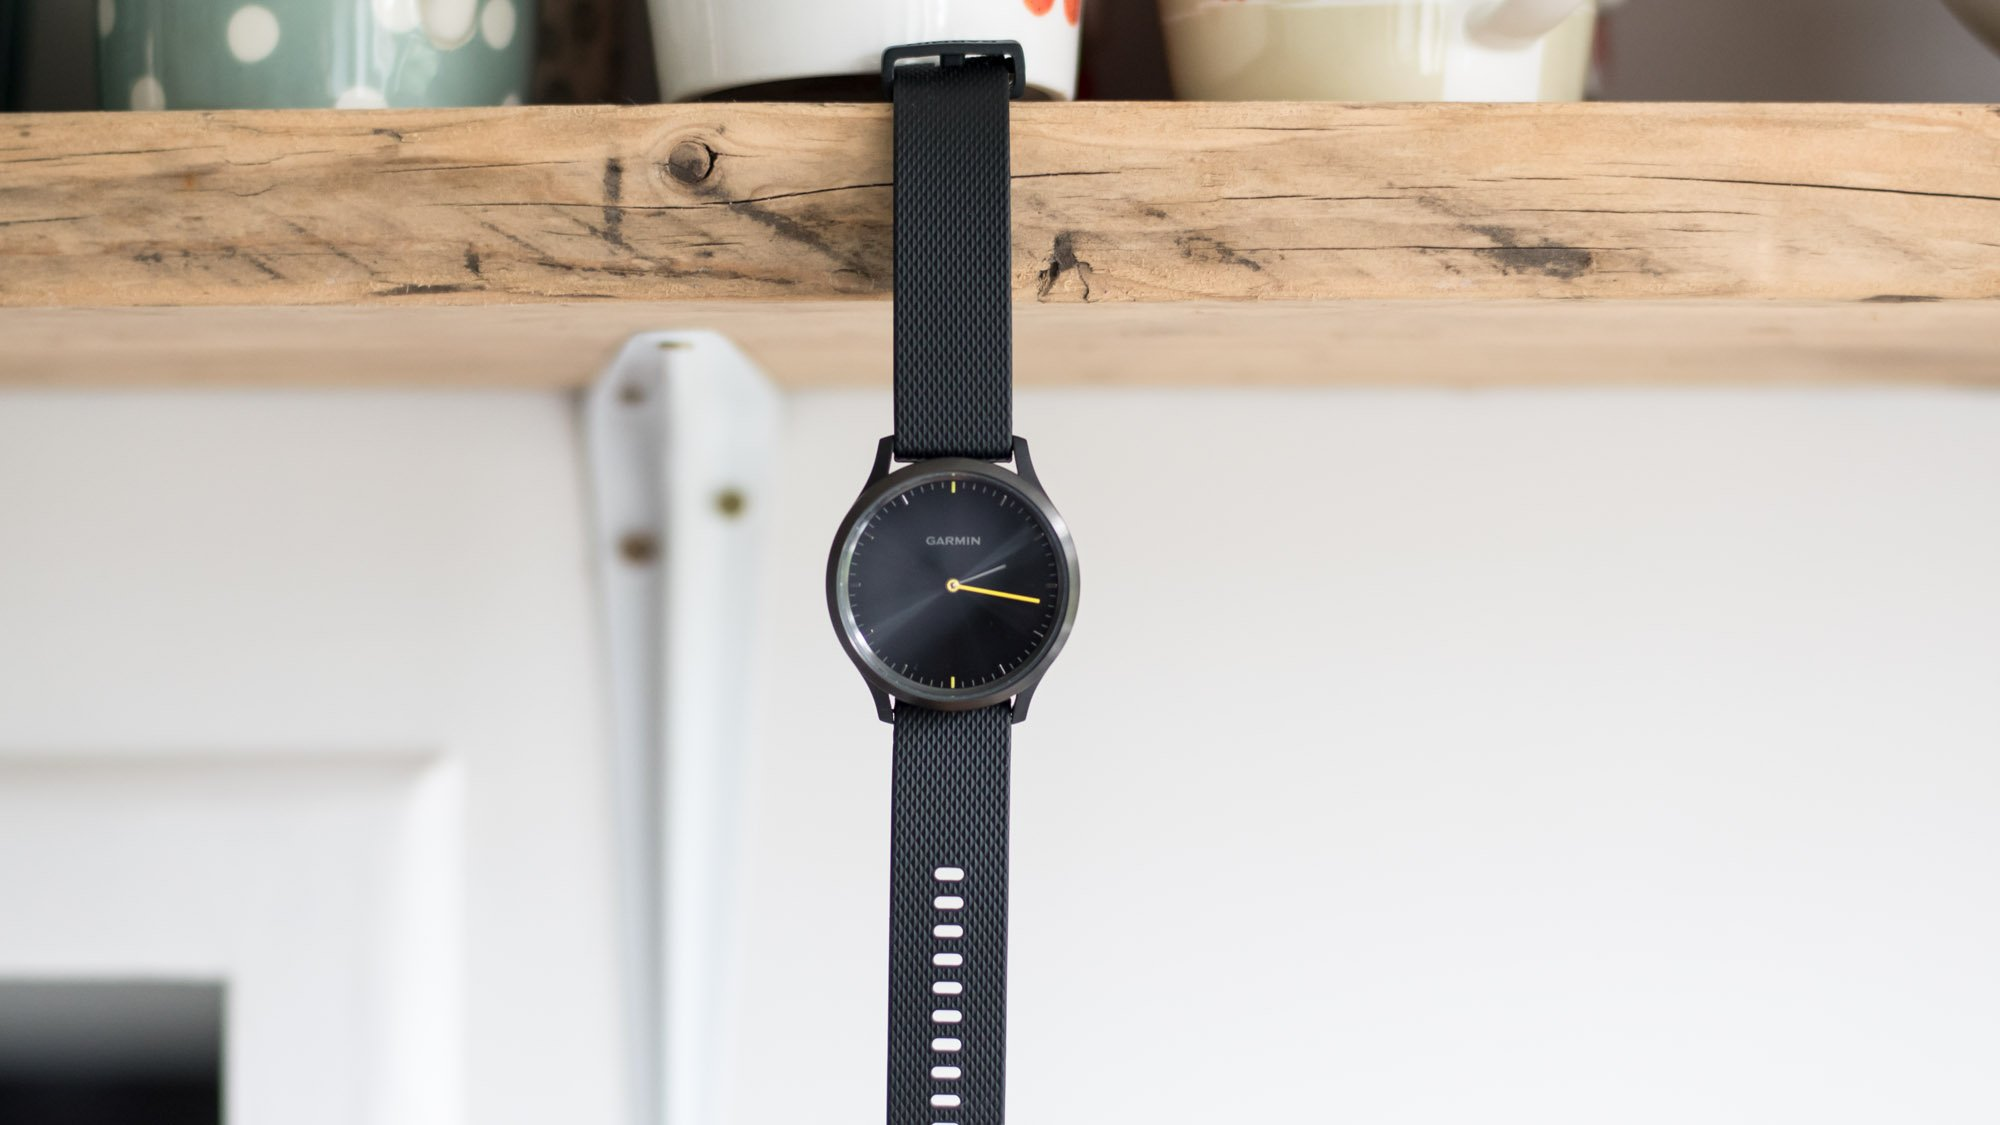 Garmin Vivomove HR review: A fine hybrid smartwatch